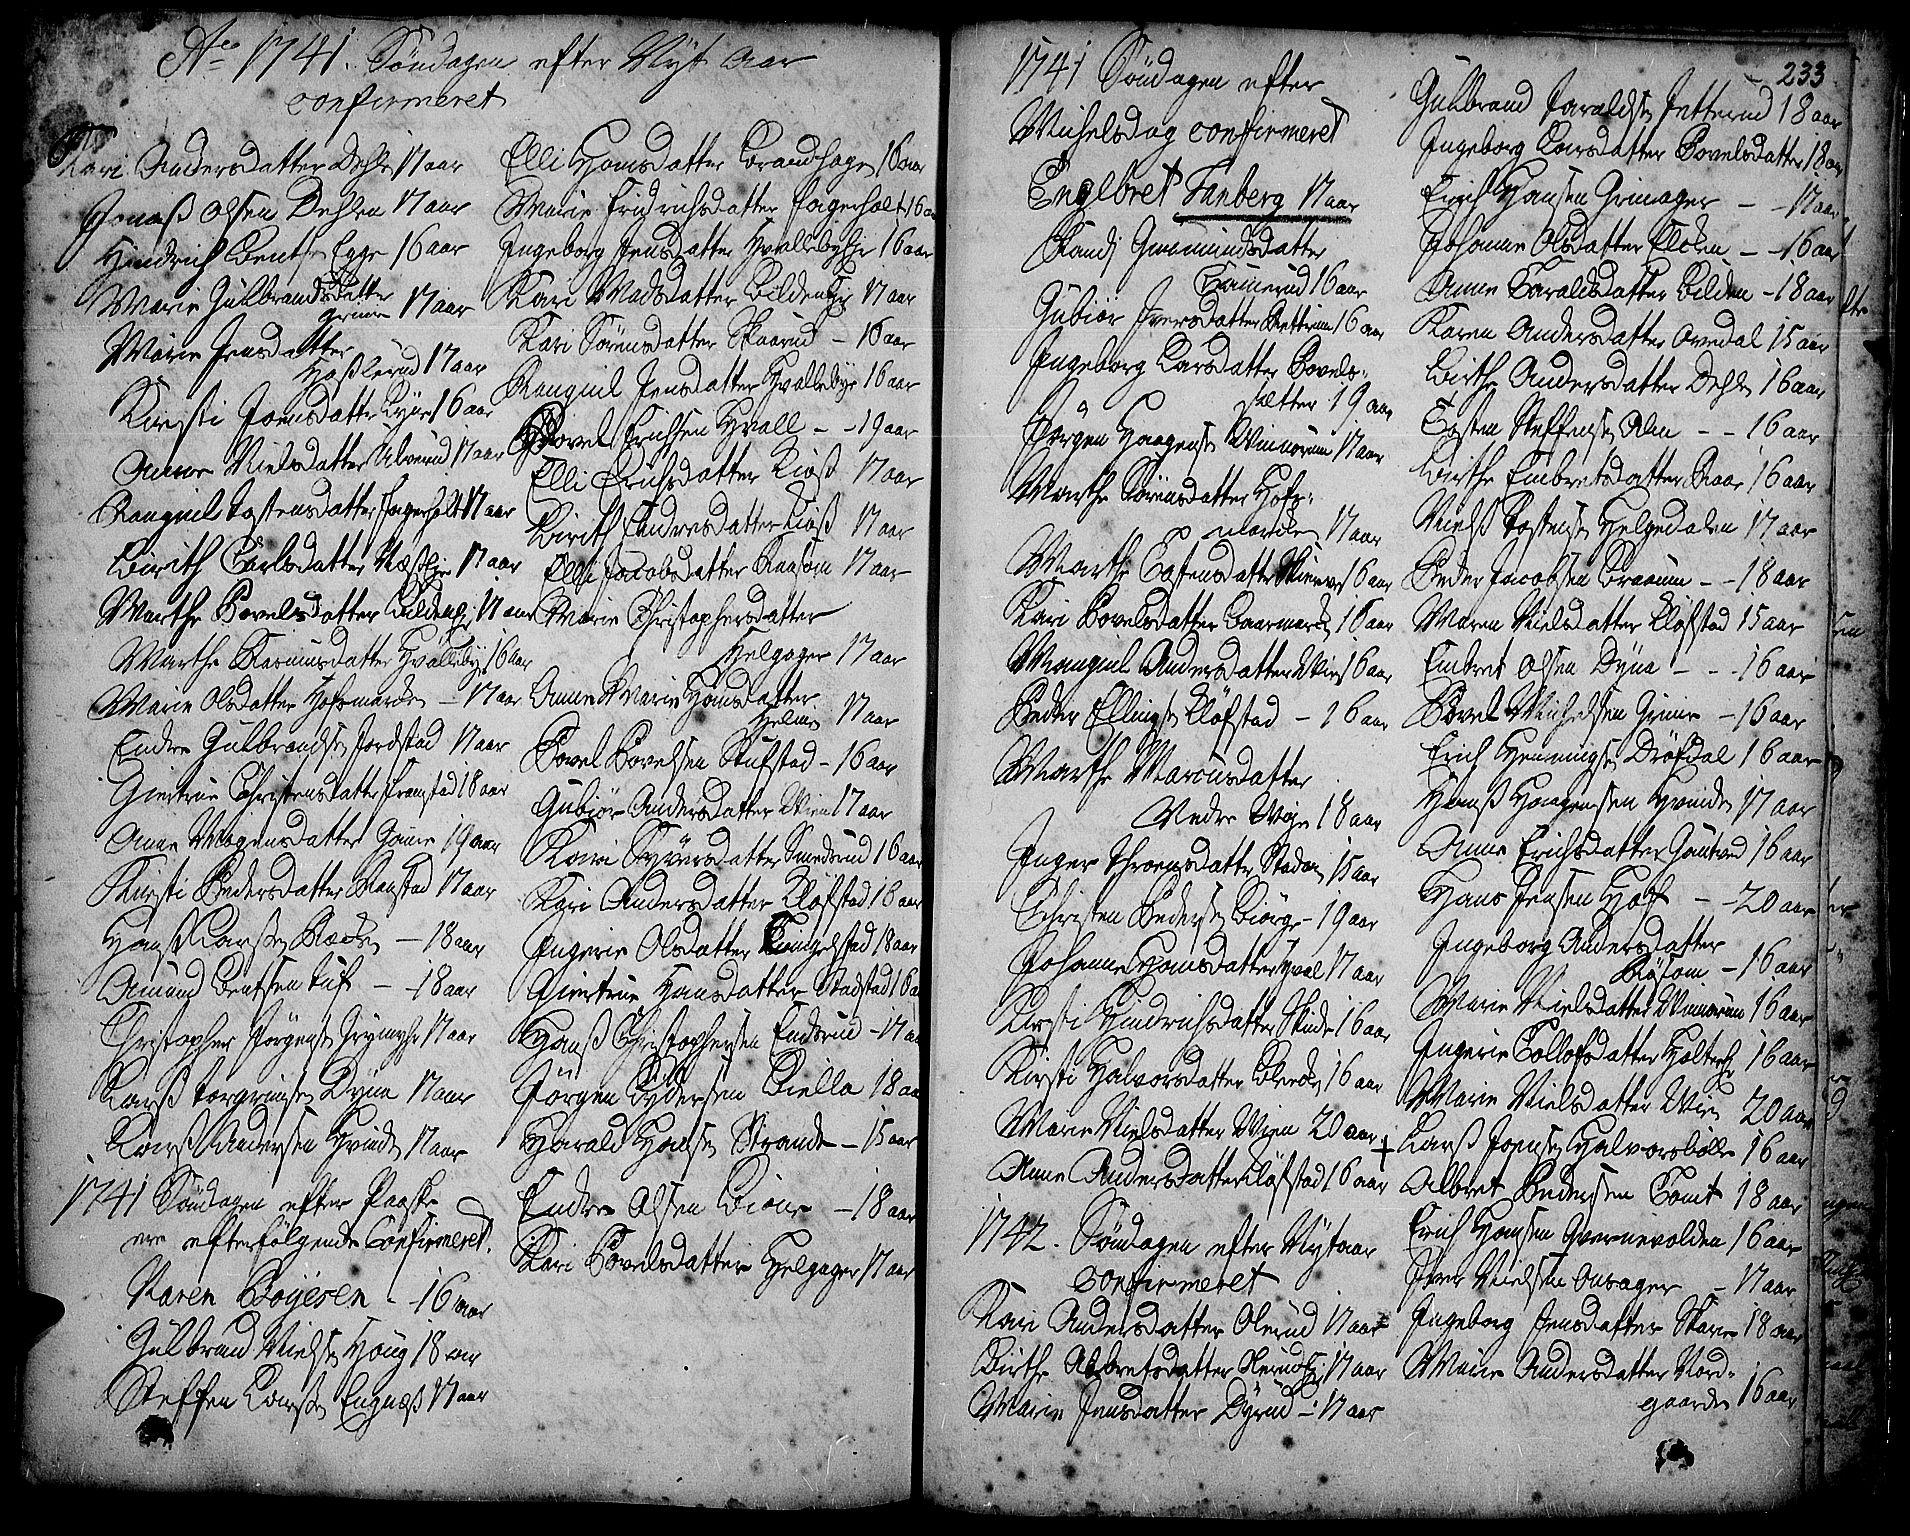 SAH, Gran prestekontor, Ministerialbok nr. 2, 1732-1744, s. 233